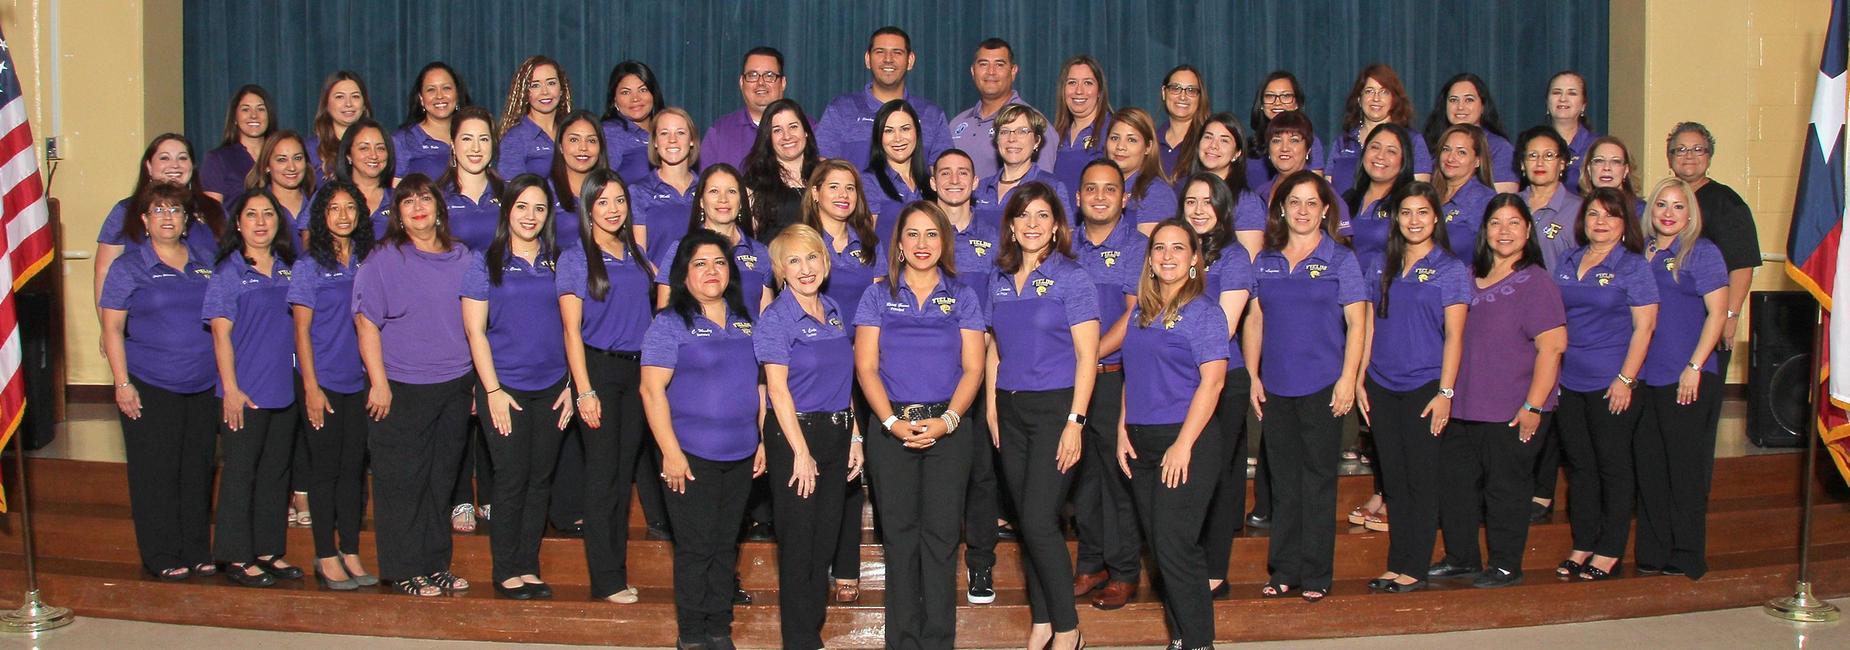 Victor Fields Elementary 2017-2018 Staff